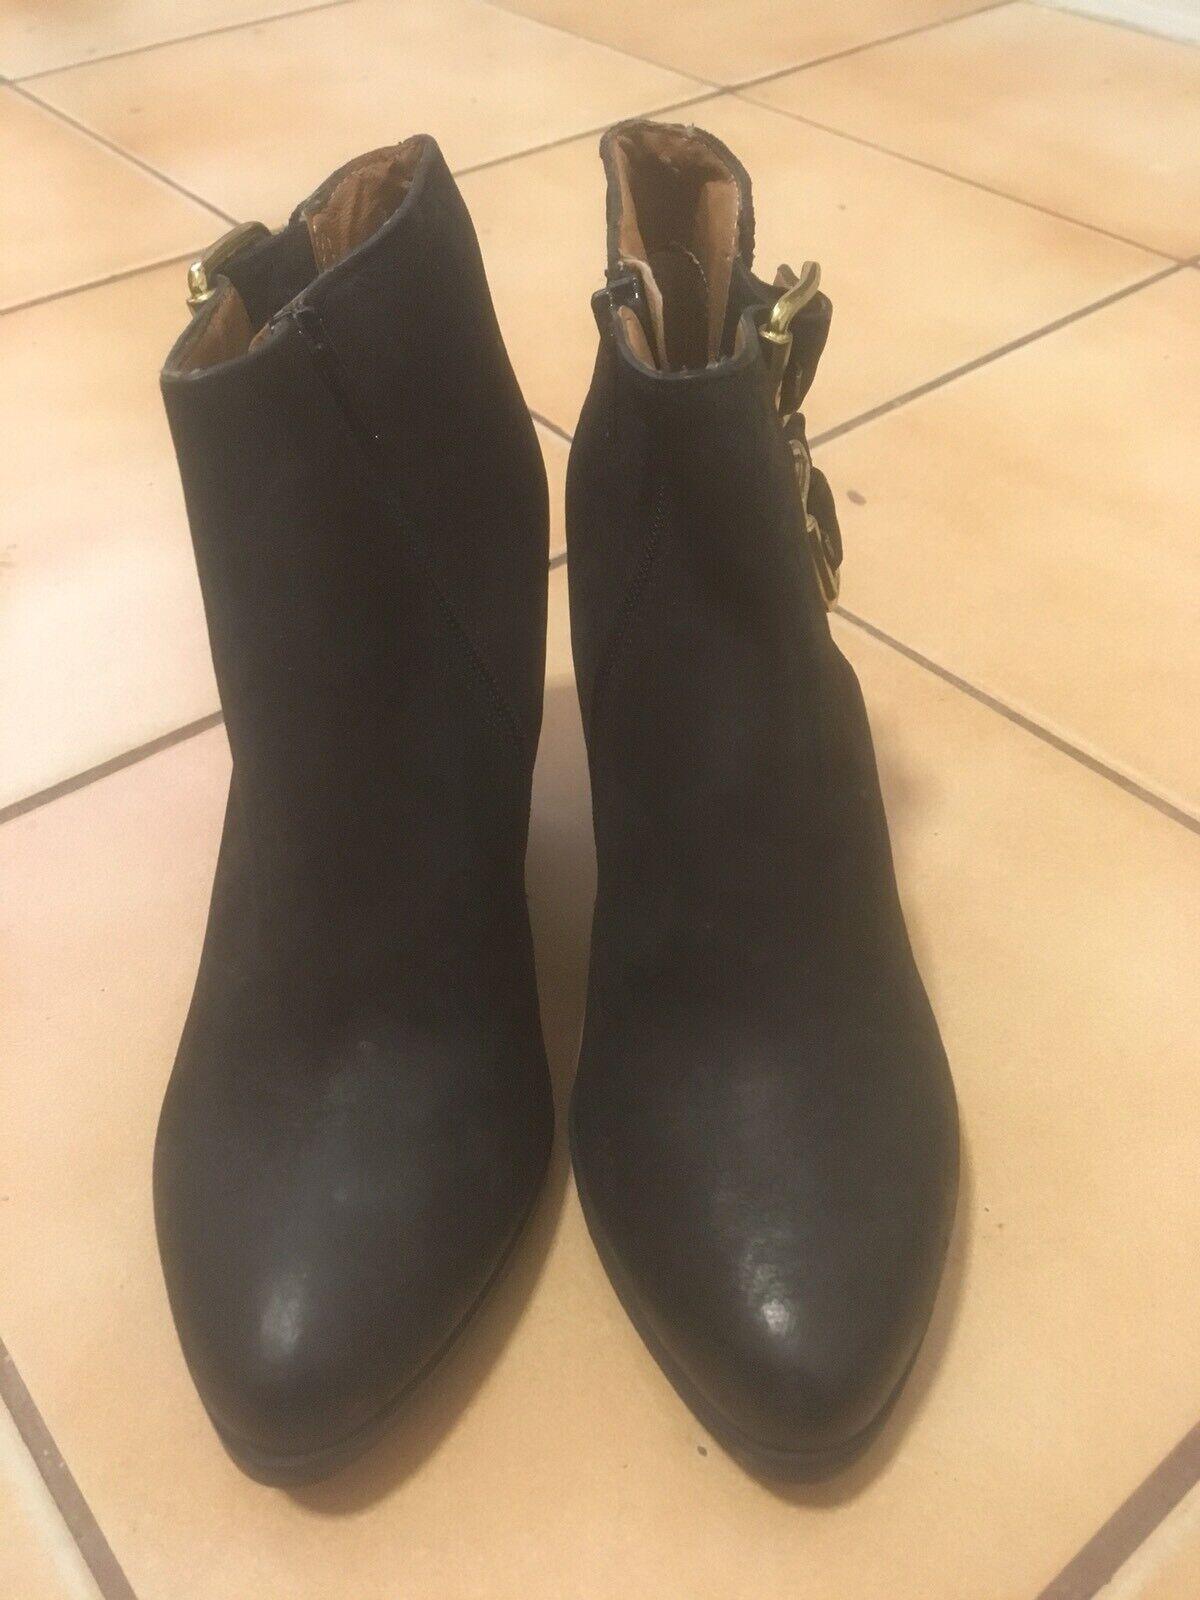 Ankle Stiefel  Carvela Kurt Geiger schwarz Leather Größe Größe Größe Uk 3  36 b14430